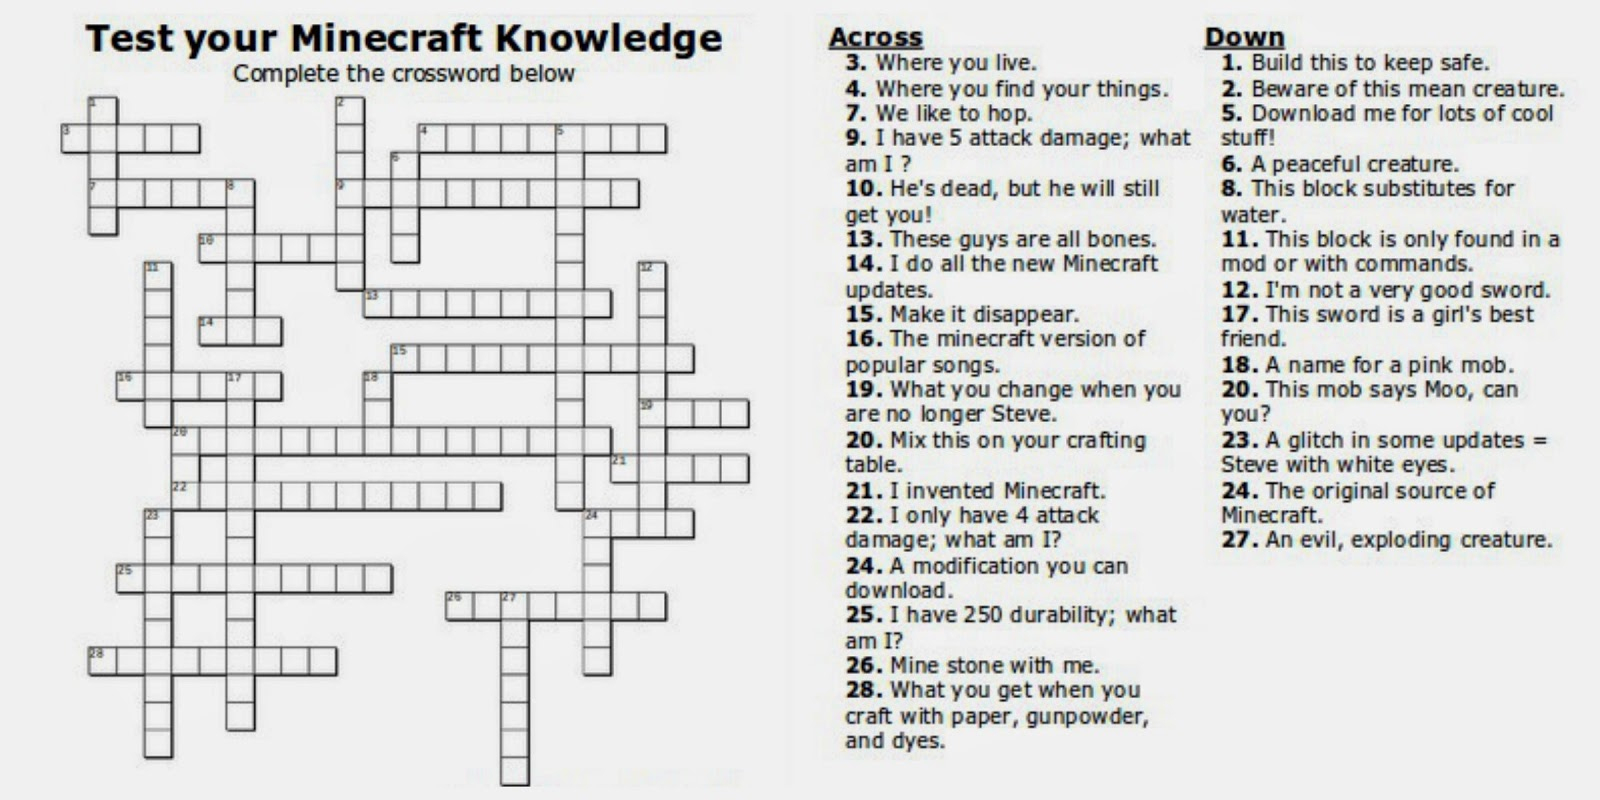 Free Printable Minecraft Crossword Search: Test Your Minecraft - Printable Junior Crossword Puzzles